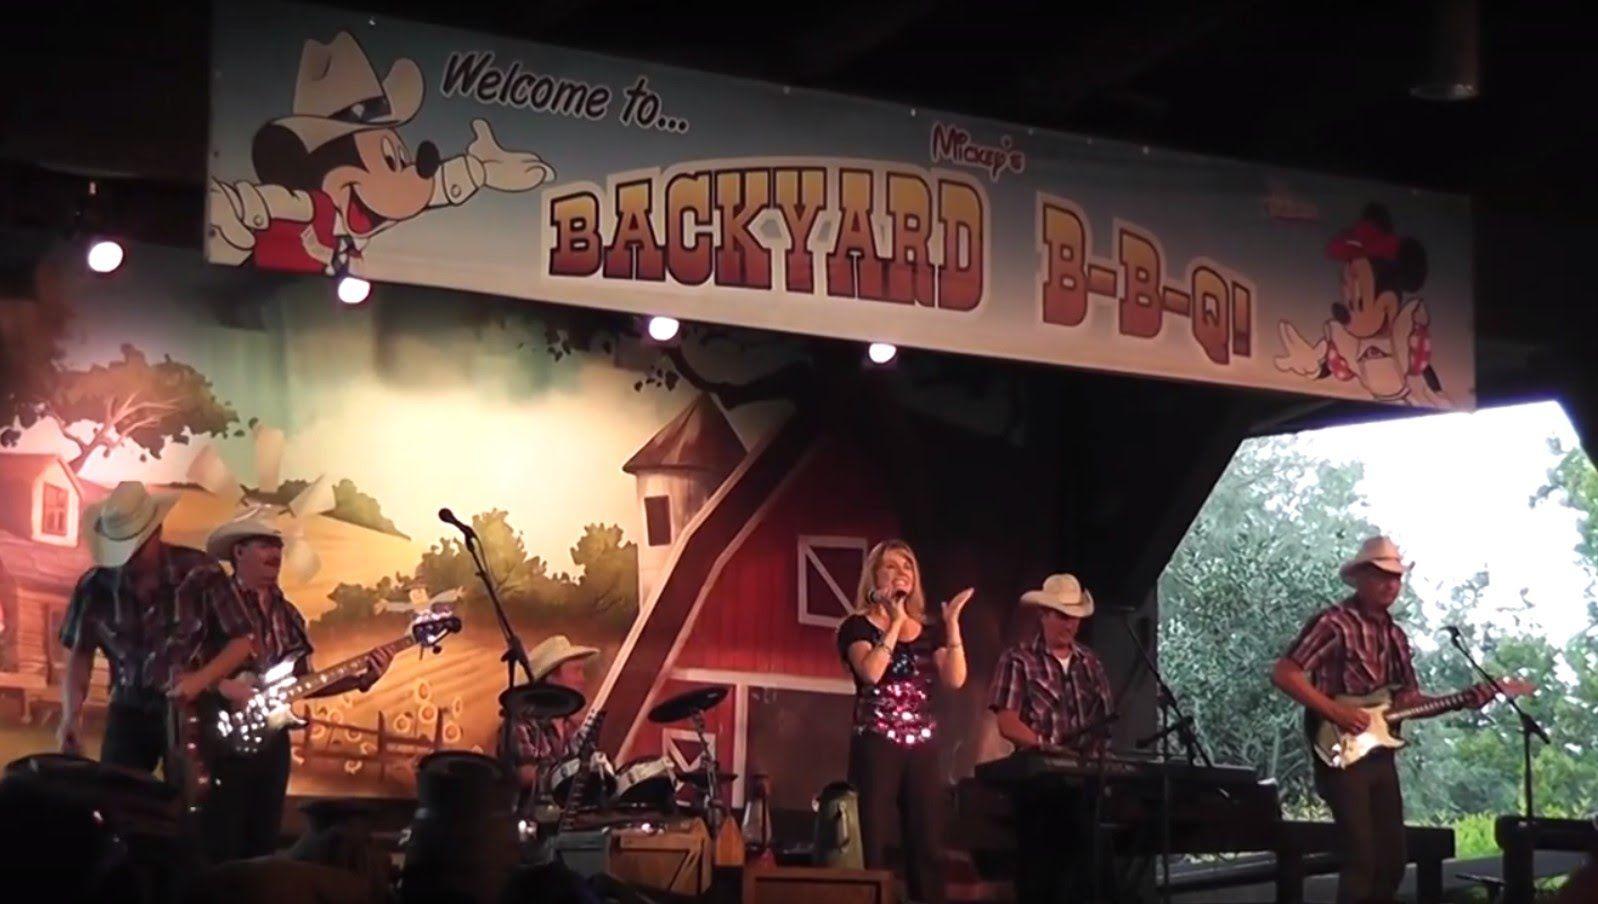 Mickey Backyard Bbq mickey's backyard bbq at fort wilderness in disney world | disney